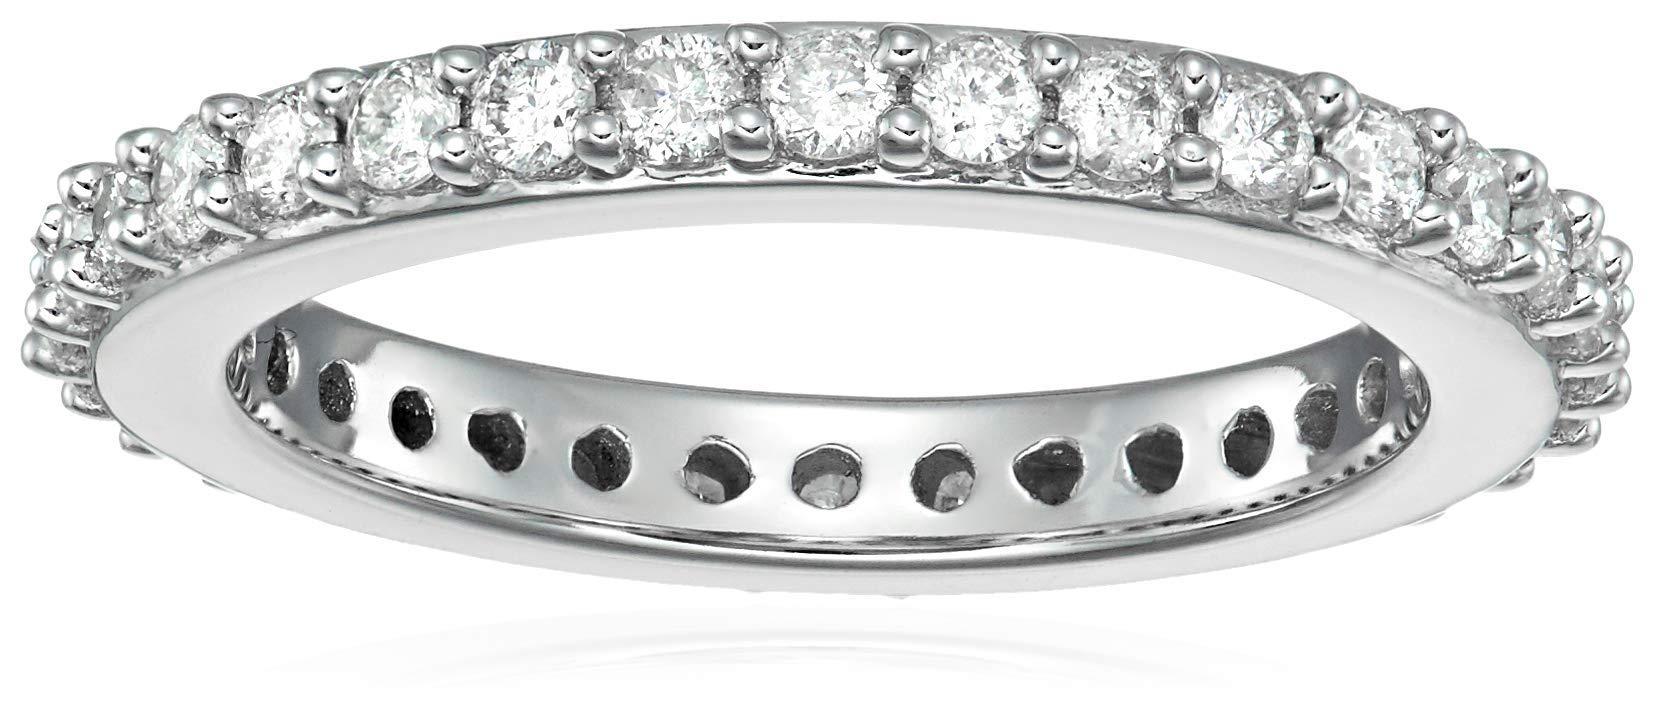 1 cttw Diamond Eternity Ring in 14K White Gold Size 5